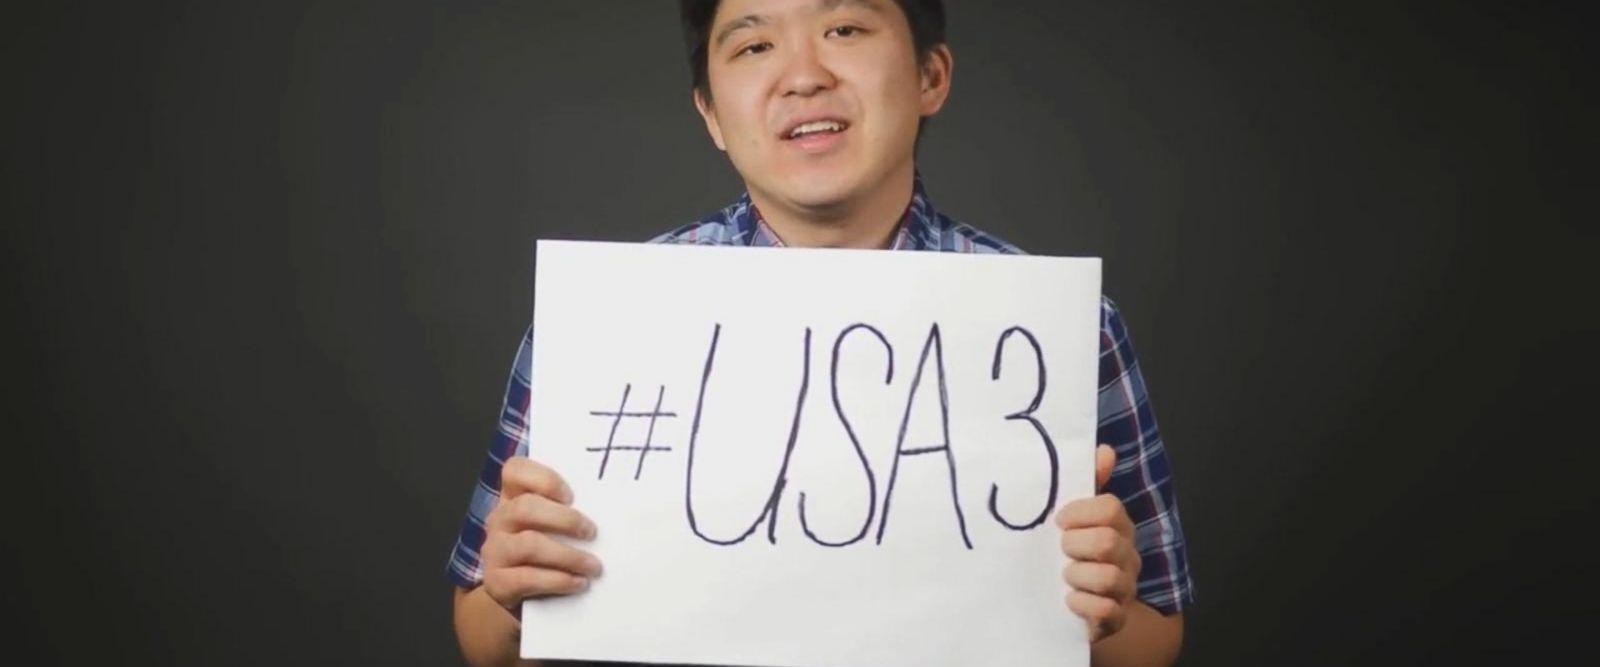 VIDEO: Son of US detainee in North Korea stays hopeful amid anticipation of Trump-Kim talk